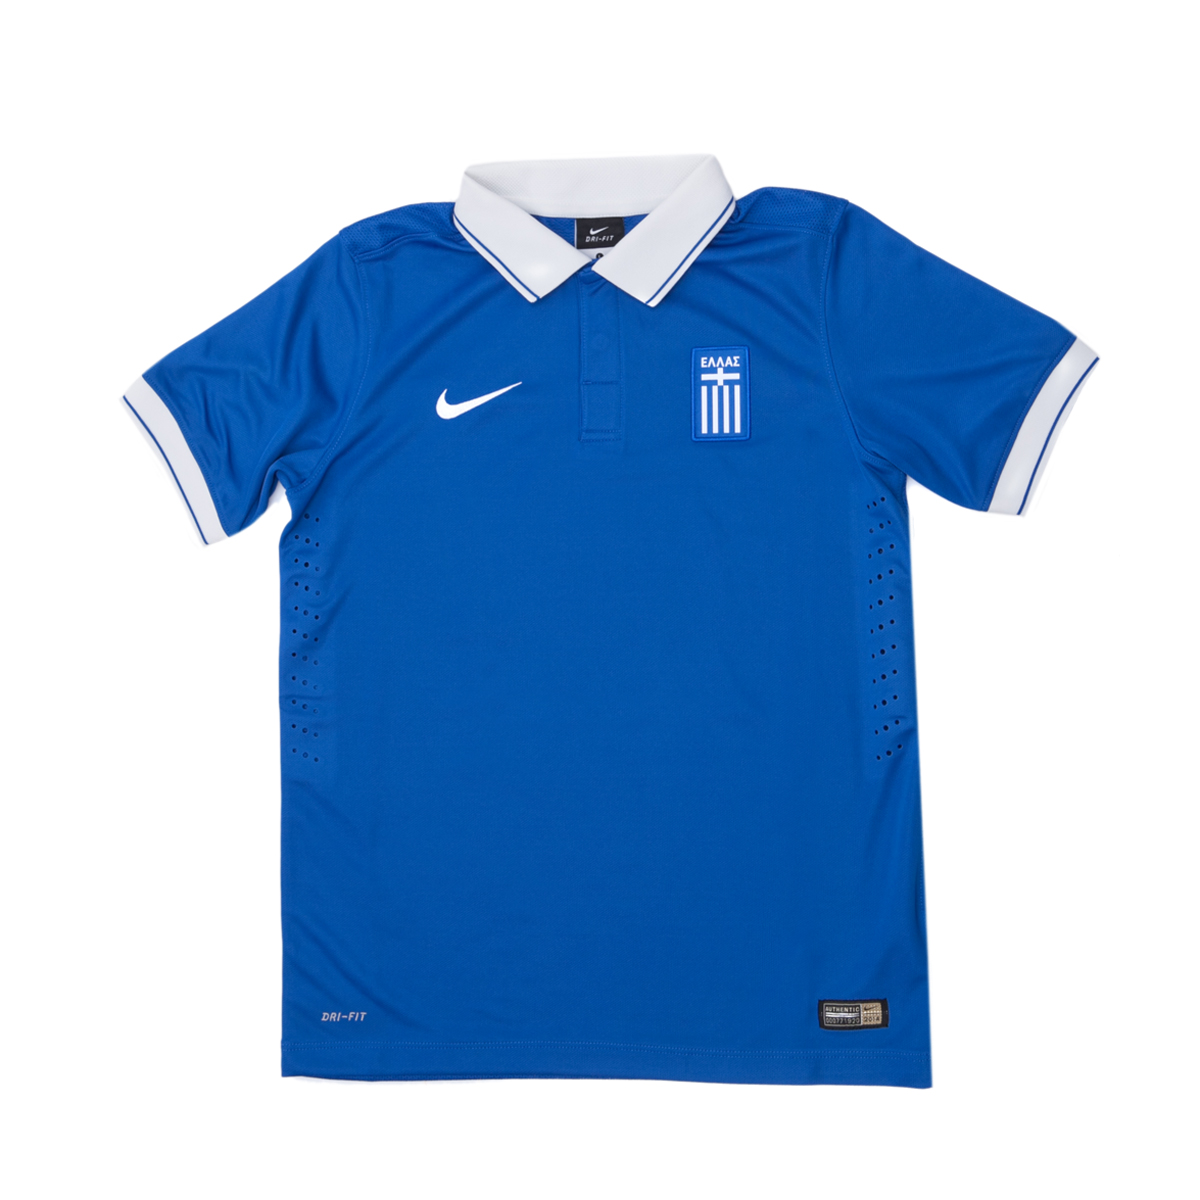 NIKE - Παιδική μπλούζα Nike μπλε